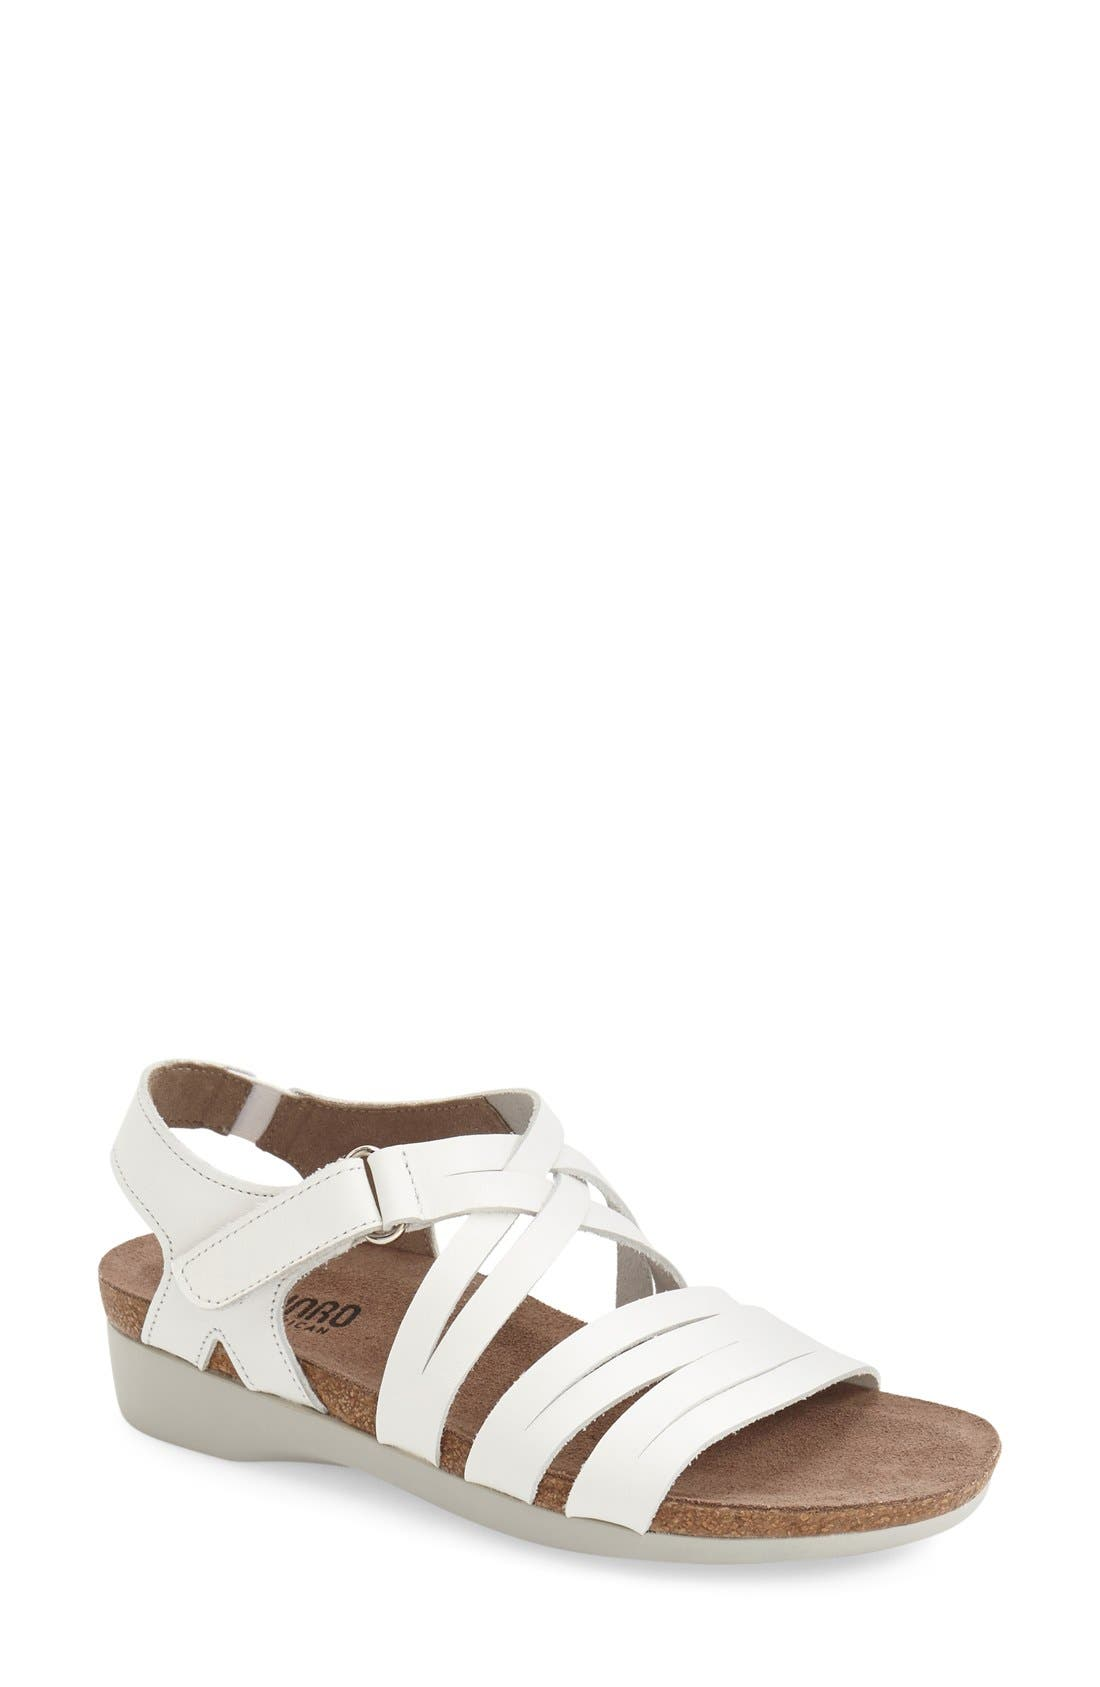 MUNRO 'Kaya' Strappy Sandal